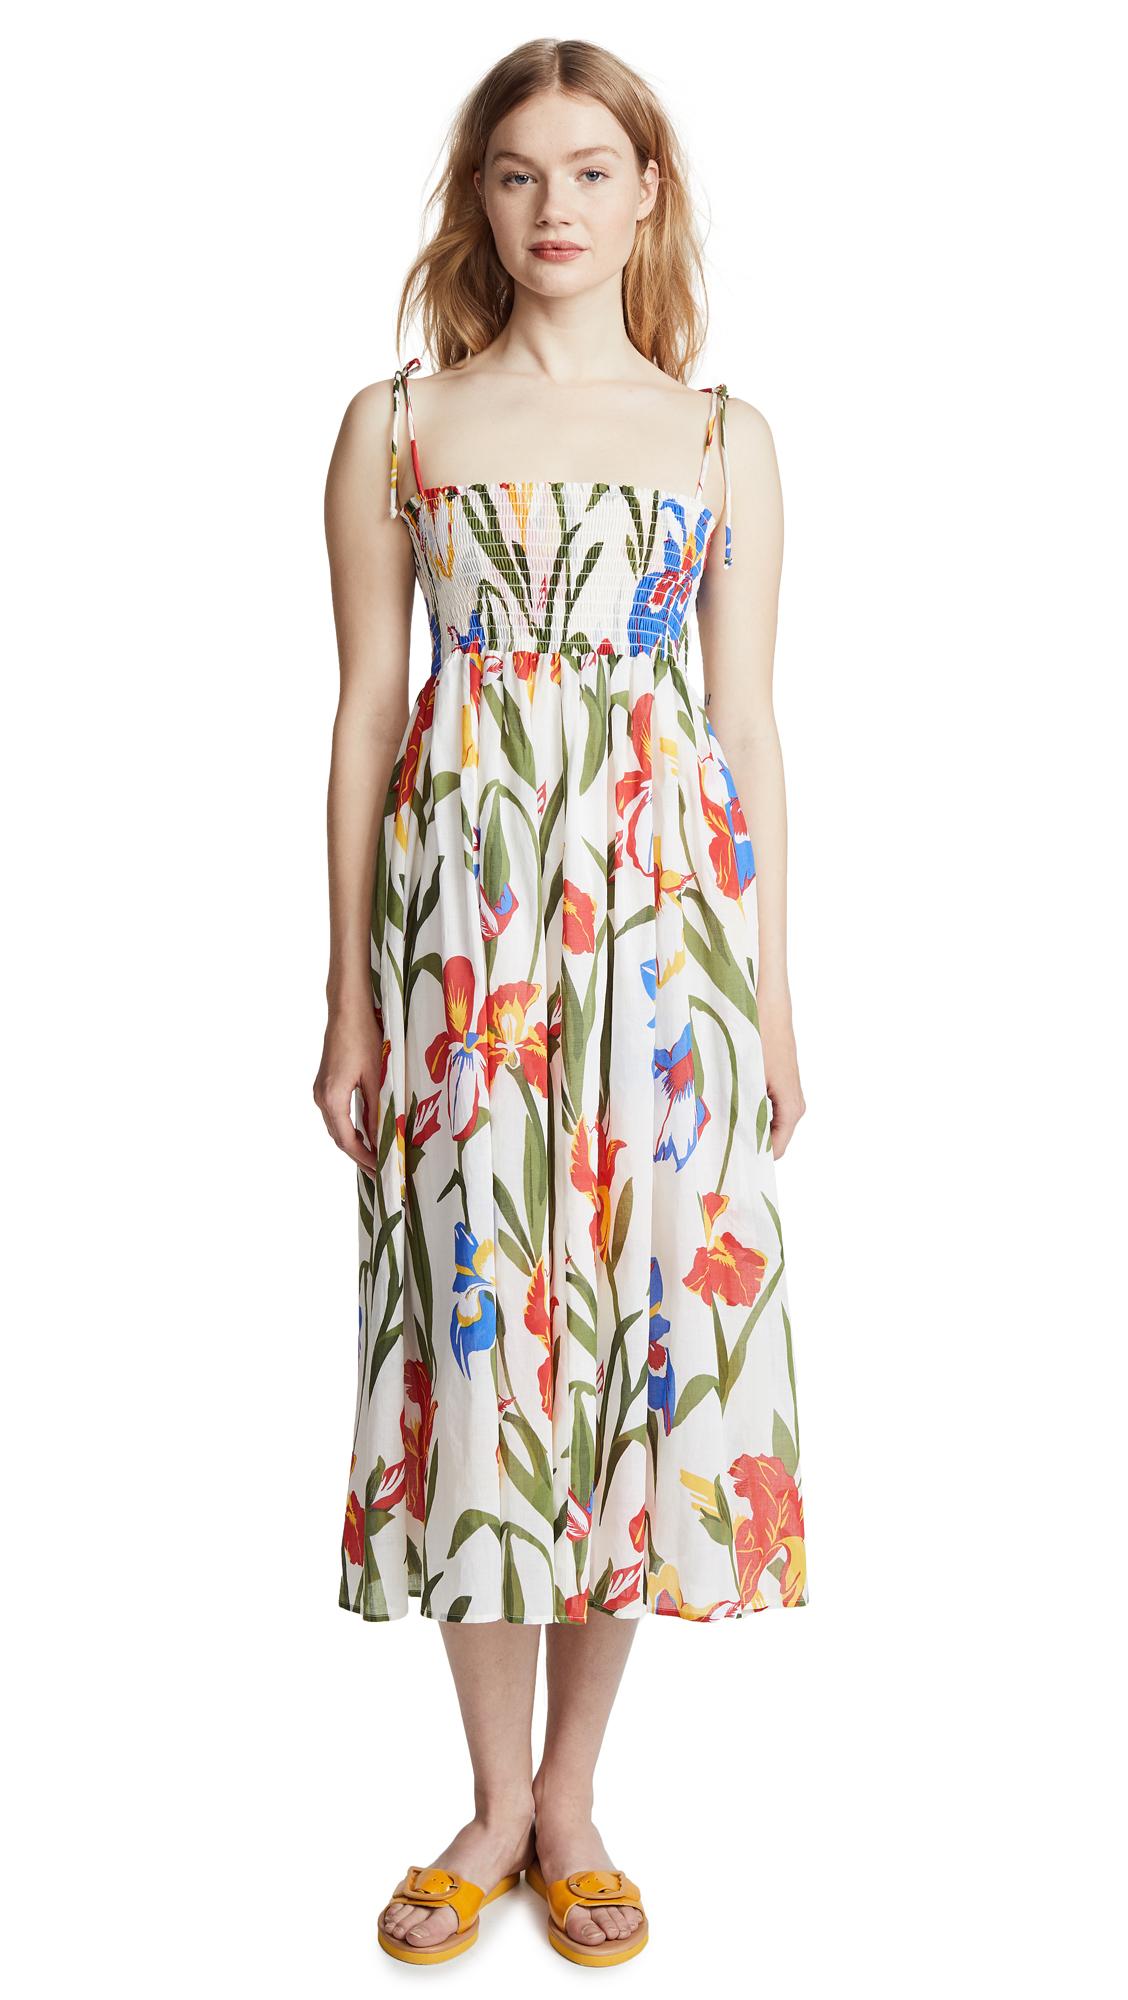 bfbd435335 Tory Burch Iris Beach Dress | SHOPBOP